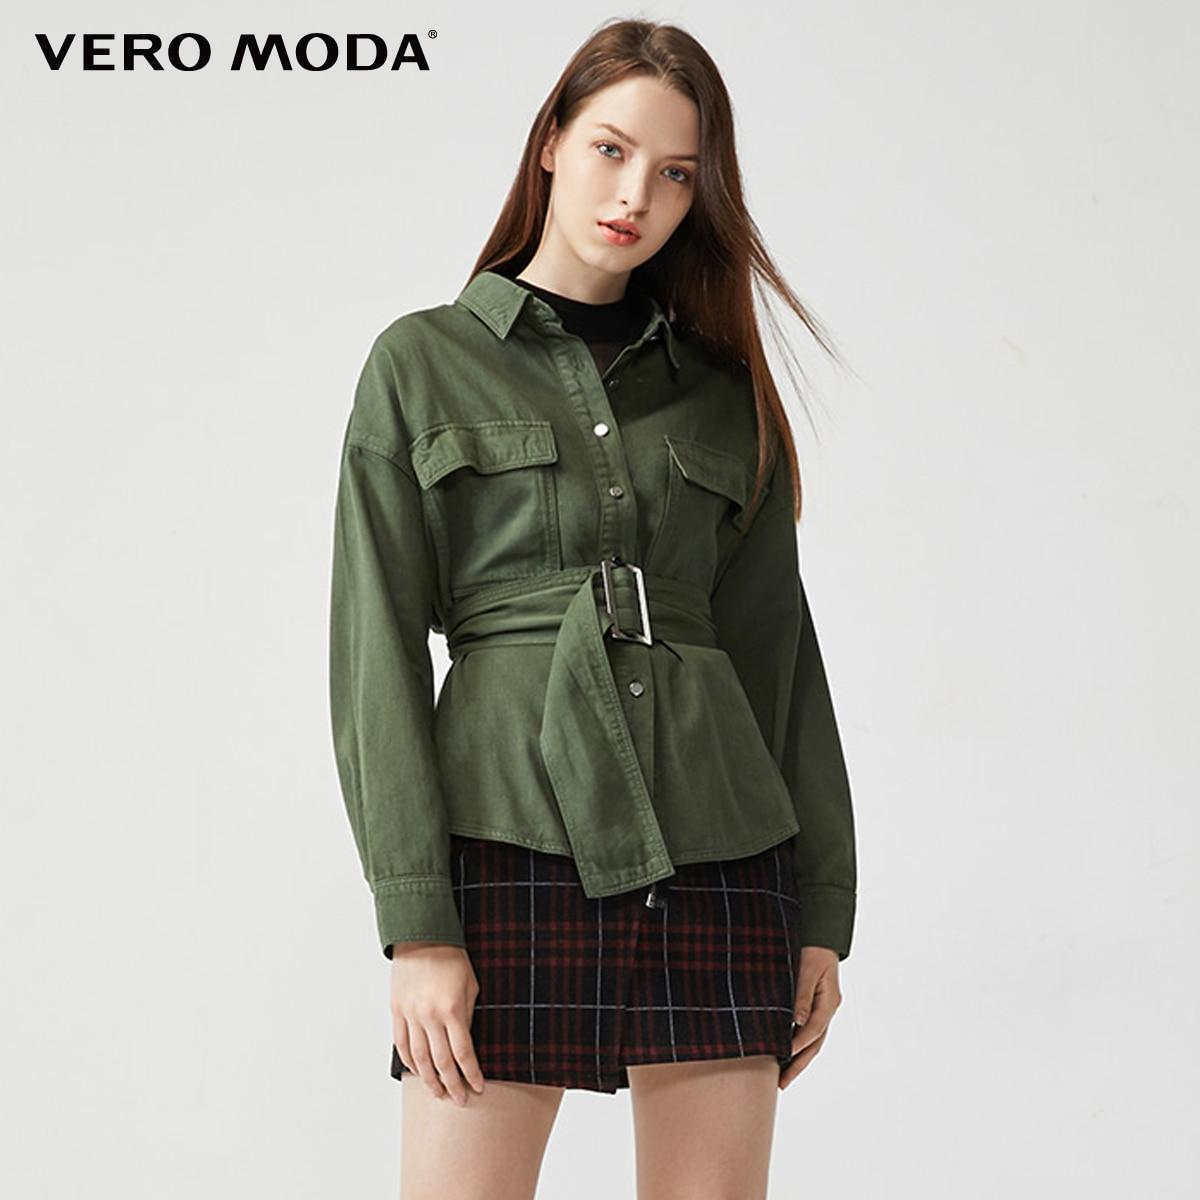 Vero Moda Women's Loose Fit Waist Army Style Shirt Jacket   319362501